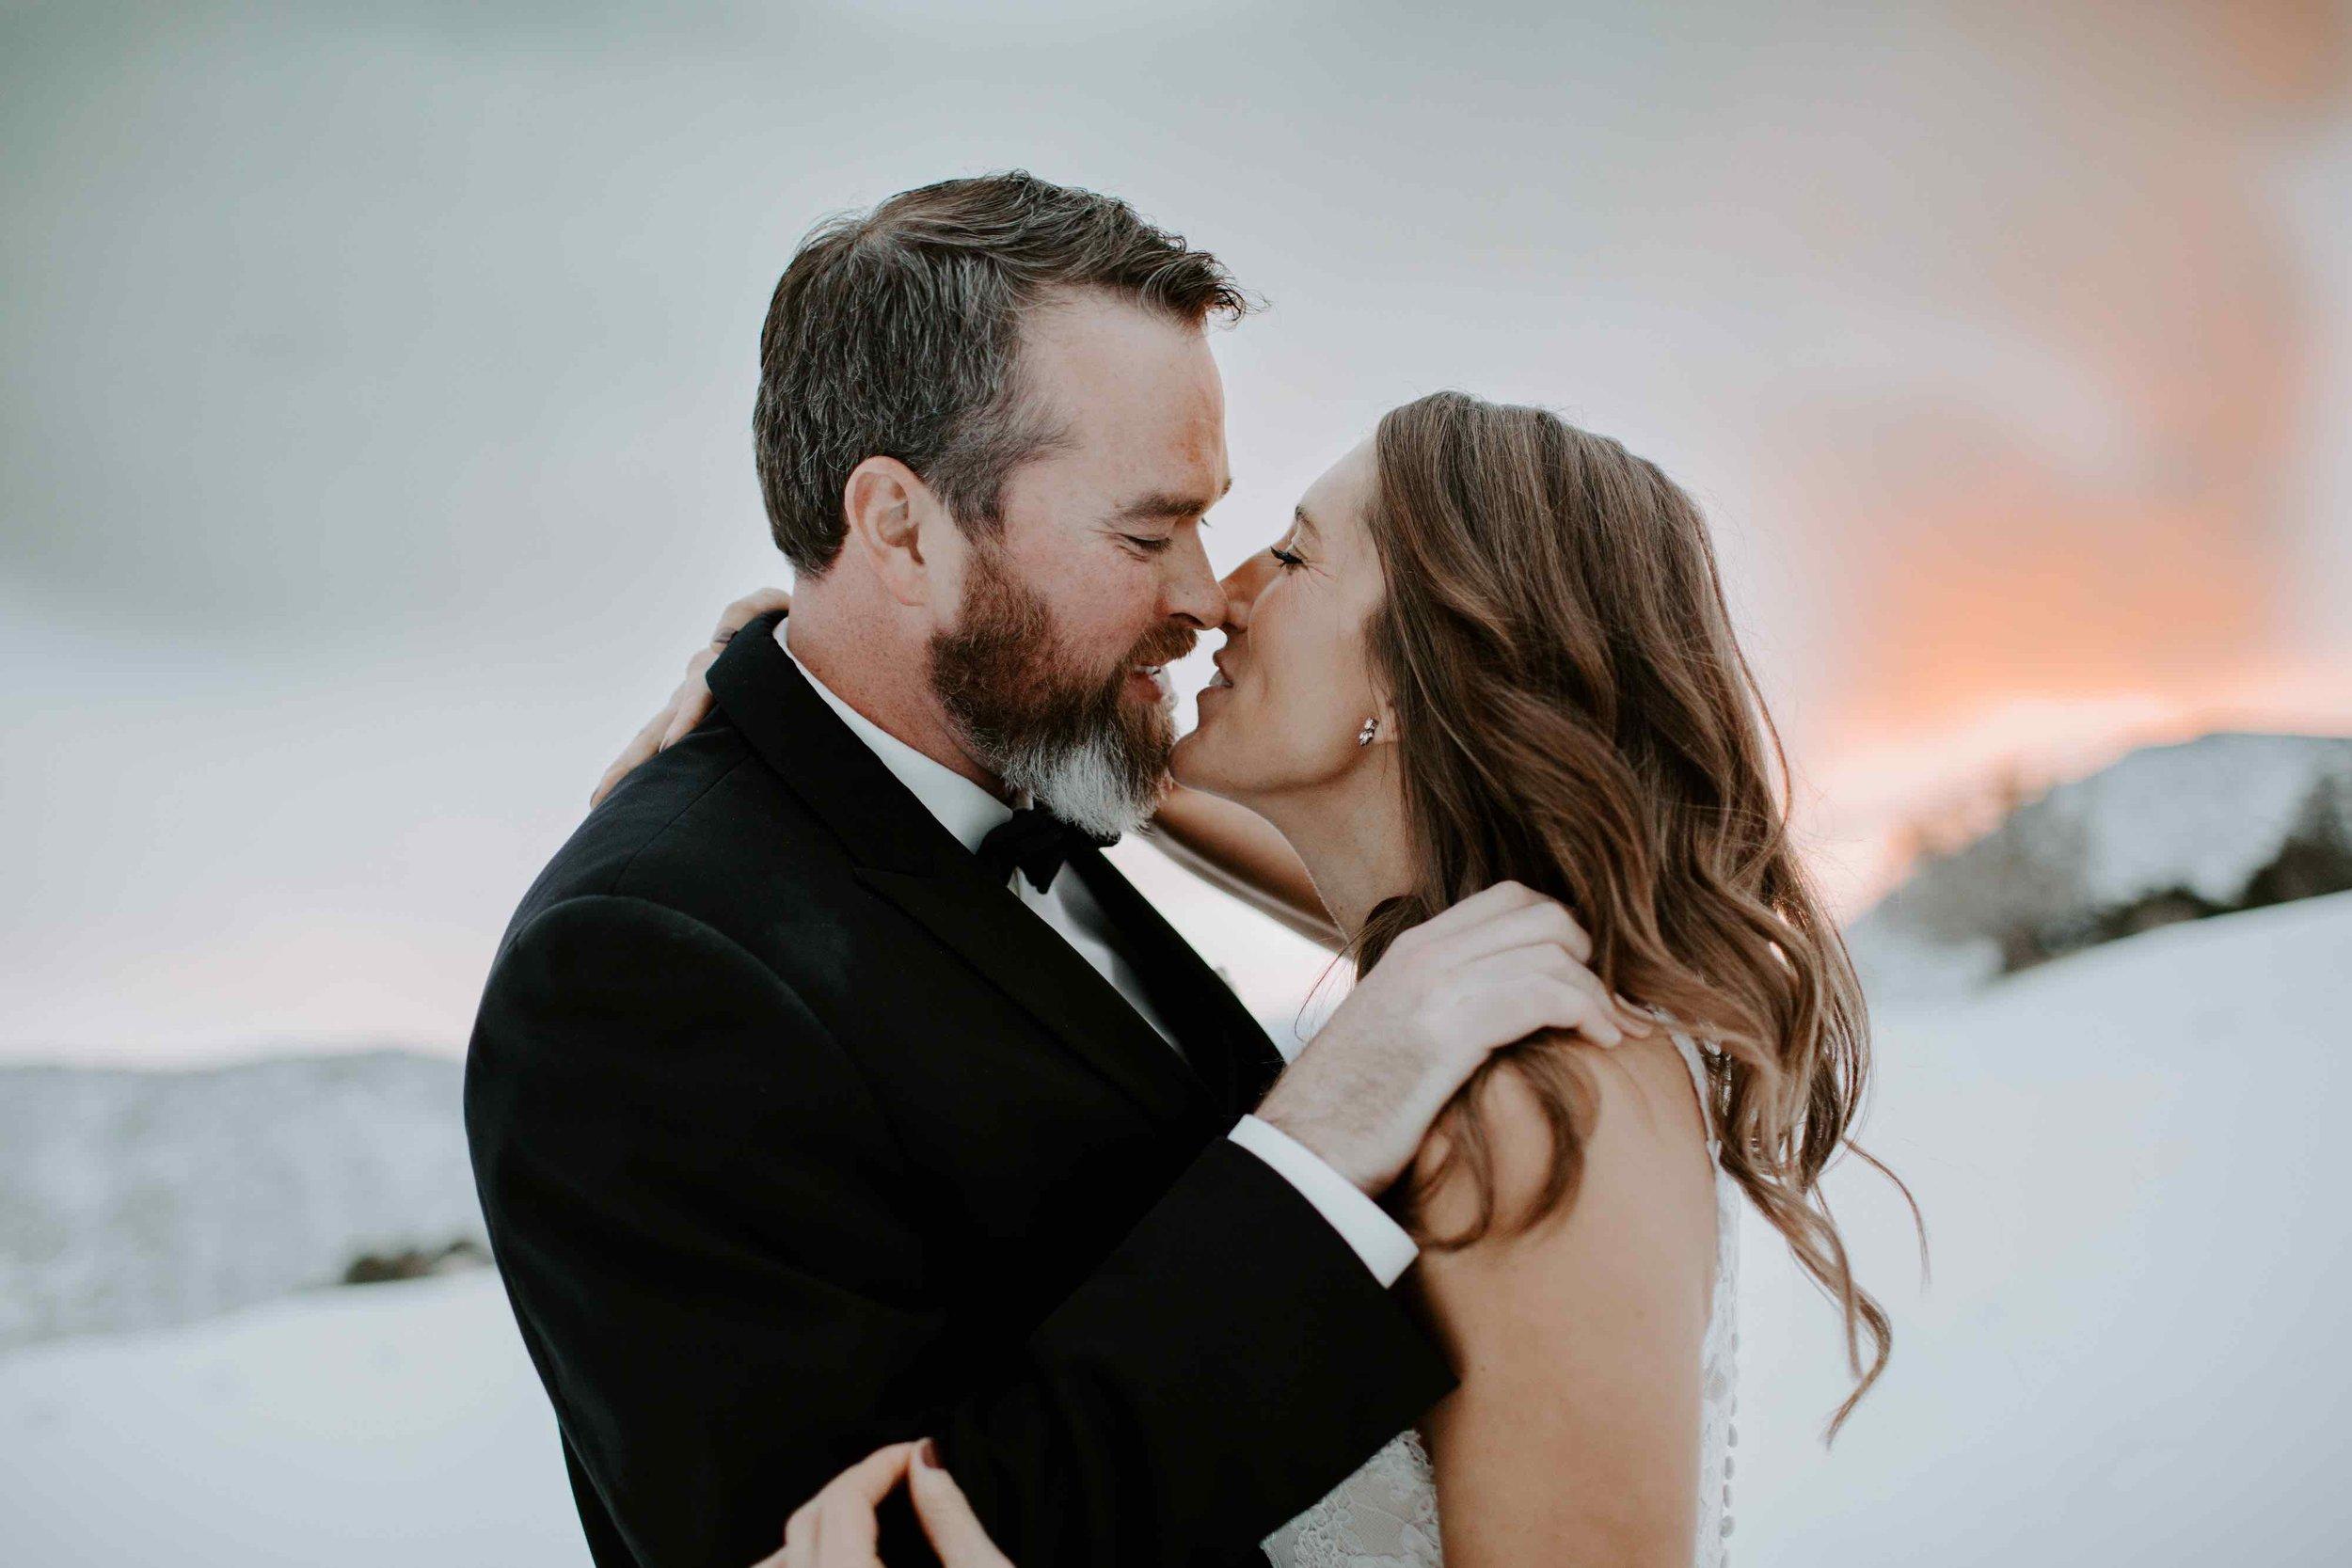 Kisa Conrad Favorites-0045-colorado-wedding-photographer-denver-springs-vailhotel-glenwood-springs-colorado-wedding-photographer.jpeg